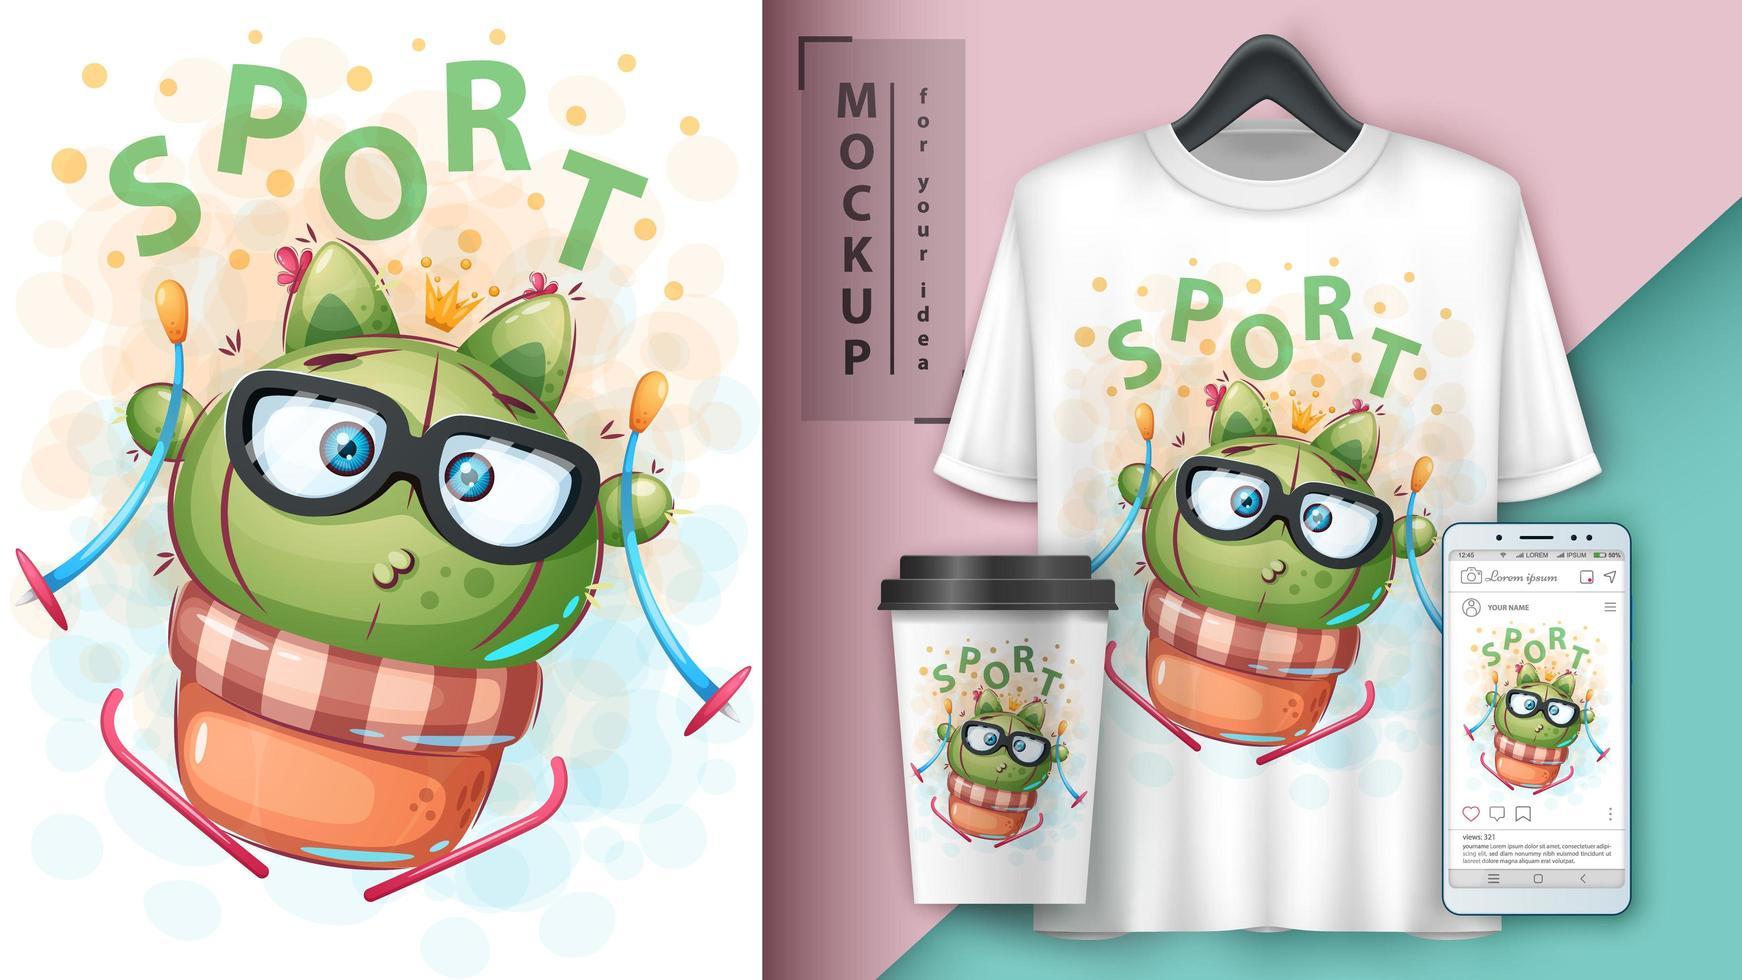 Sport Ski Cactus Cartoon Design. vector